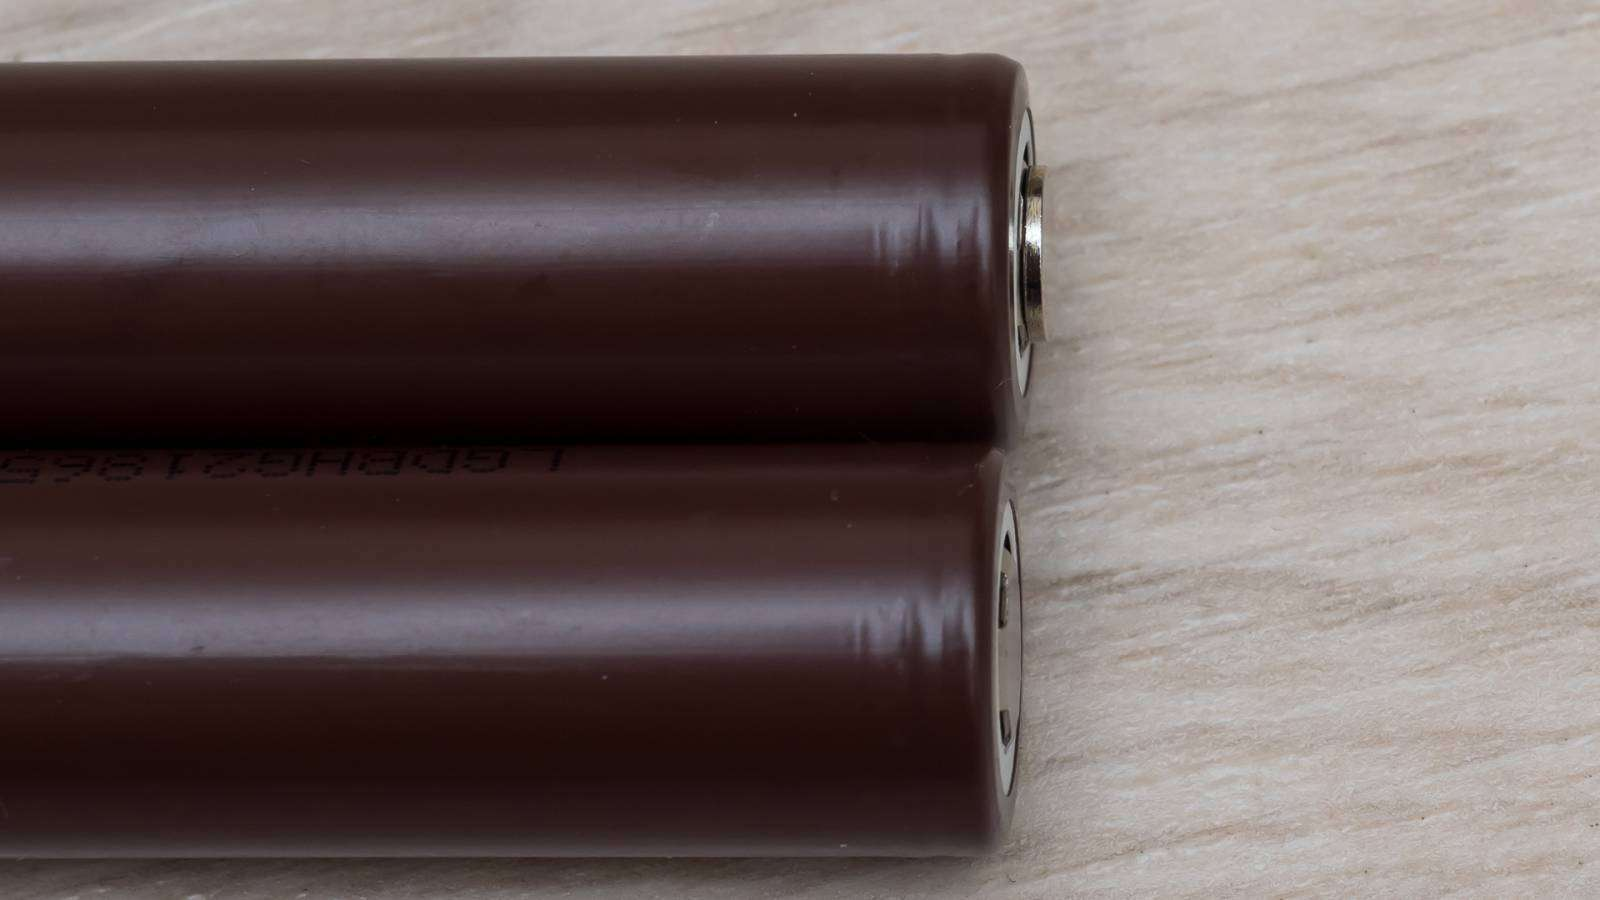 GearBest: Набор магнитов - 50 штук, 8*1 мм